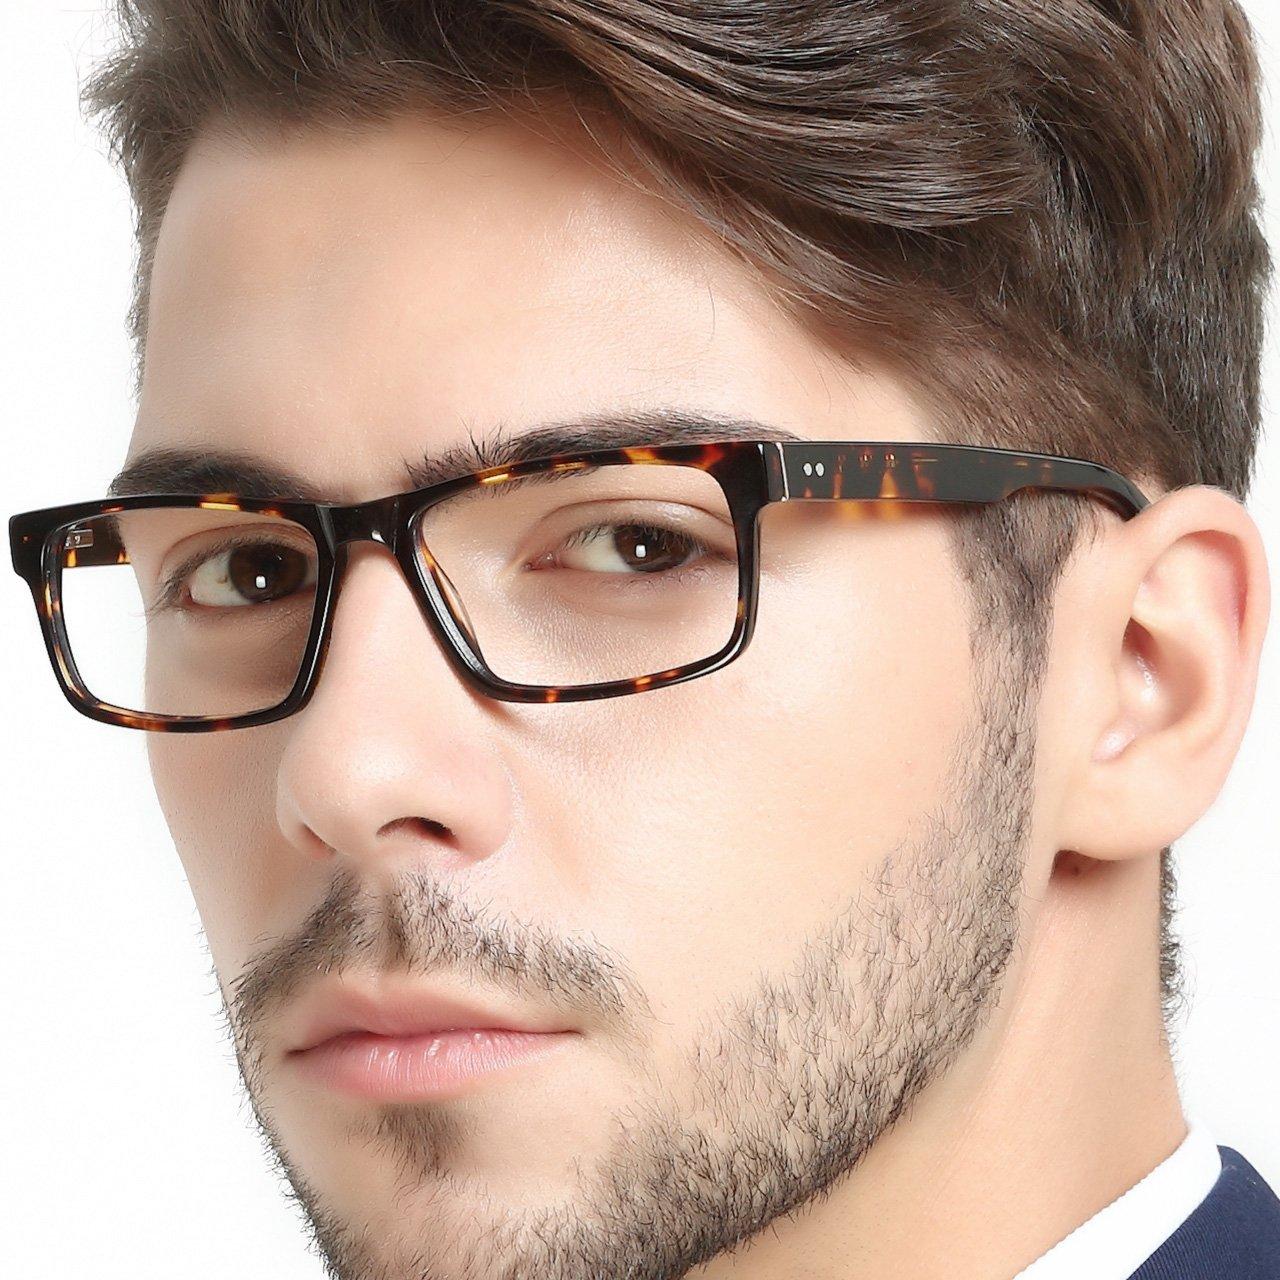 OCCI CHIARI Fashionable Flexible Rectangle Acetate Metal Decoration Eyeglasses Frame With Spring Hinge For Men Blocking UV Headache